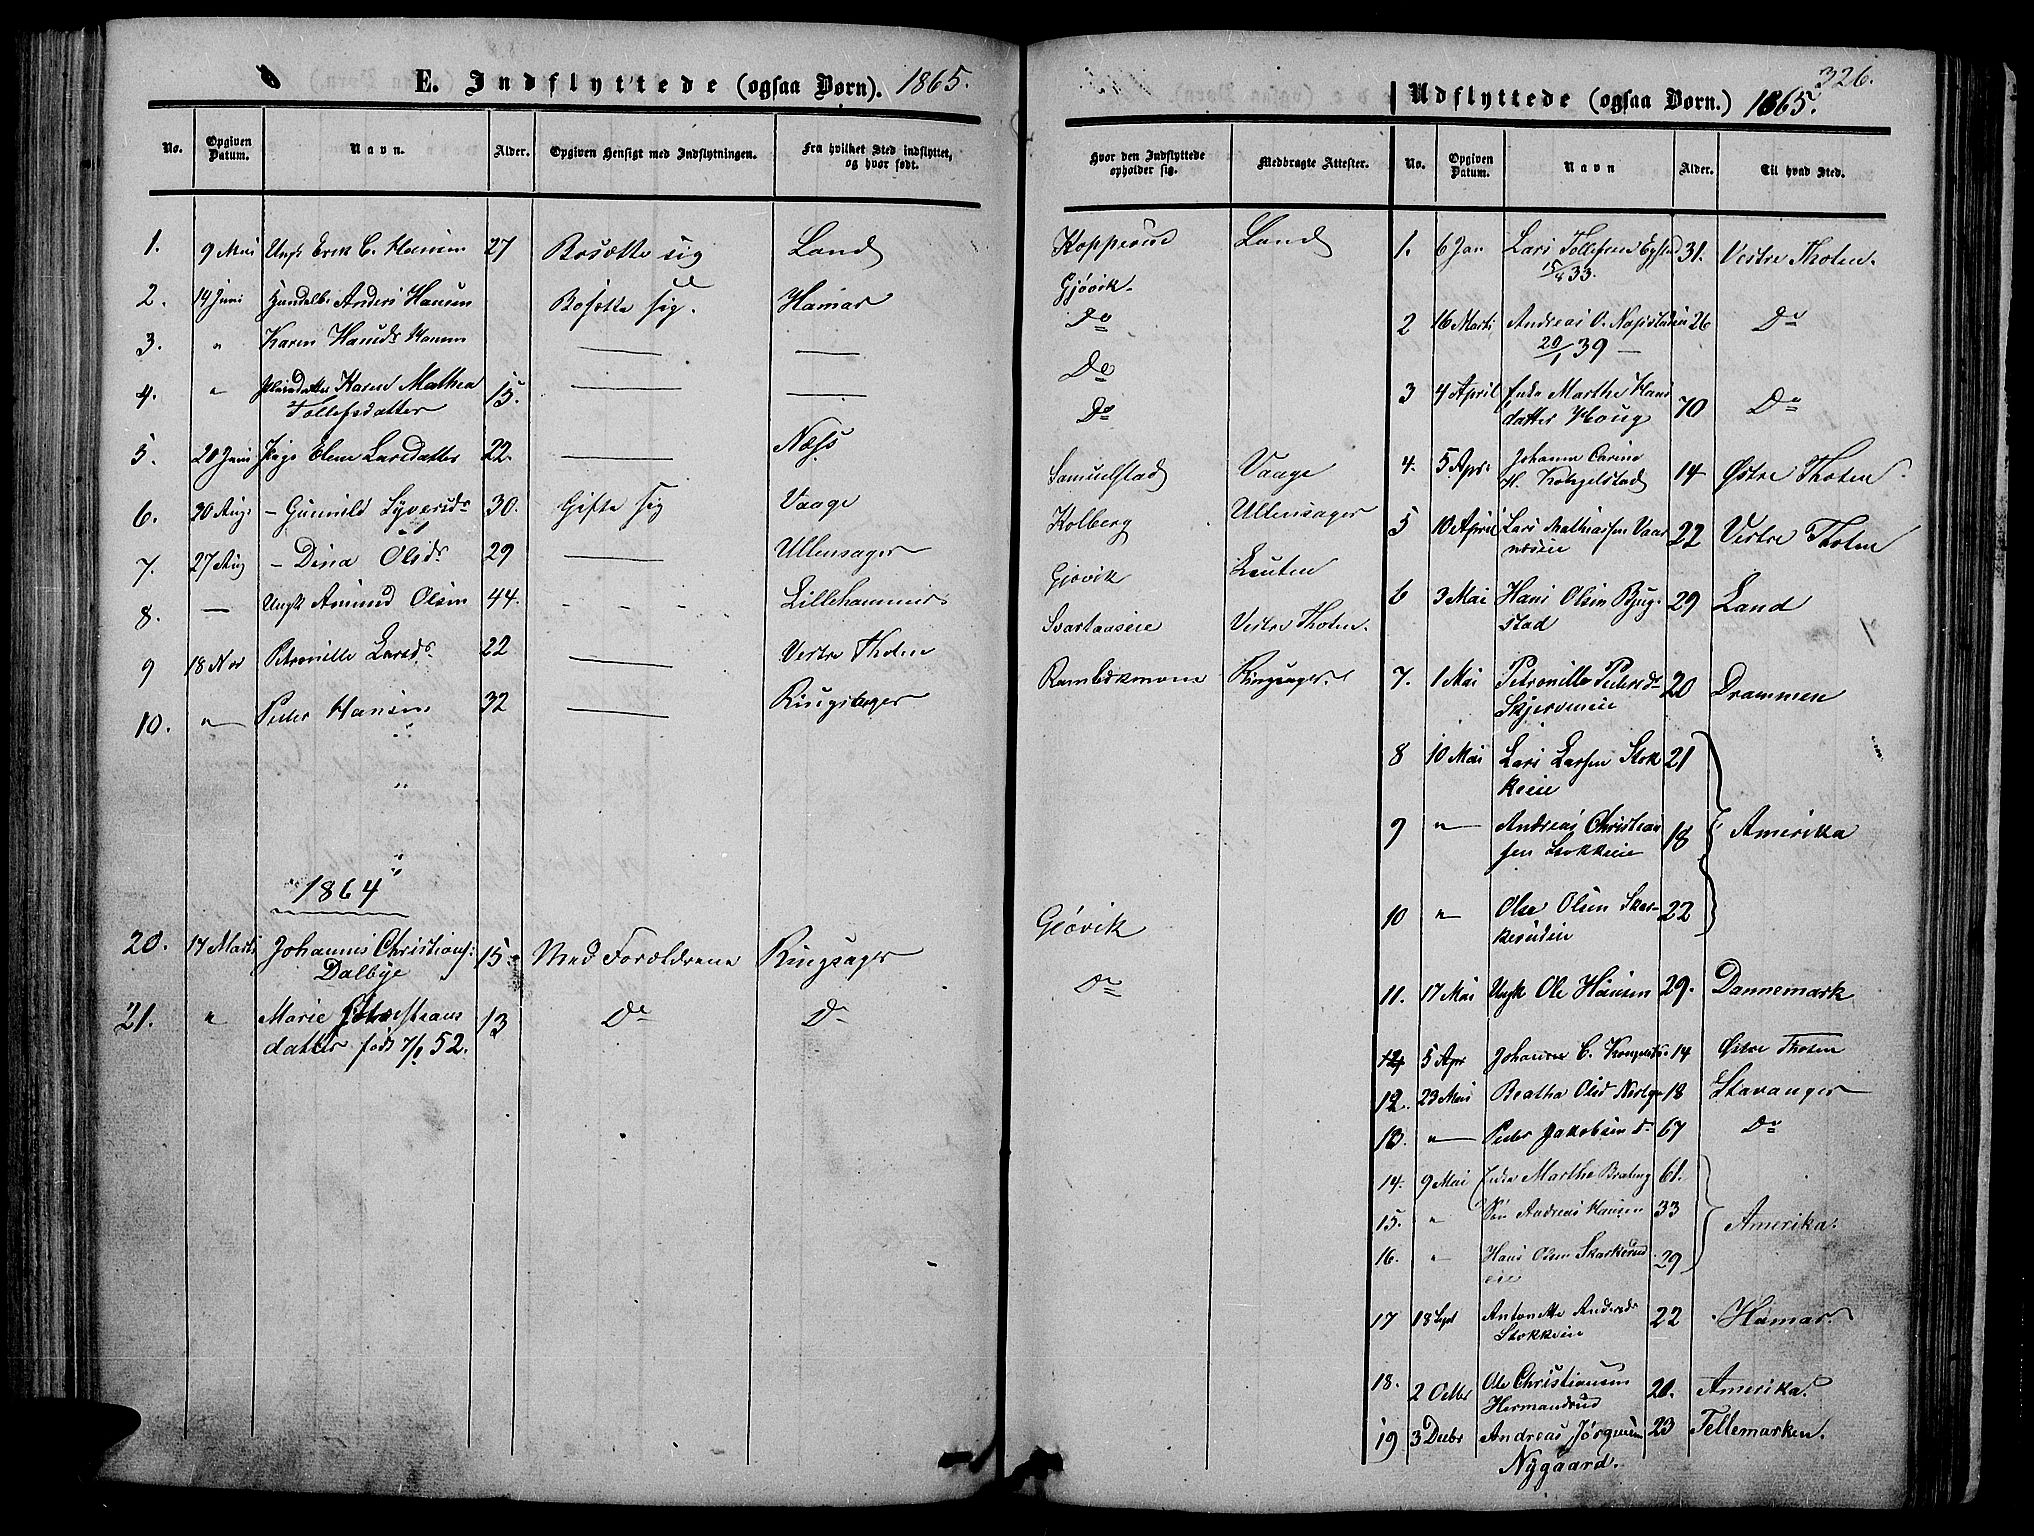 SAH, Vardal prestekontor, H/Ha/Hab/L0005: Klokkerbok nr. 5, 1854-1868, s. 326